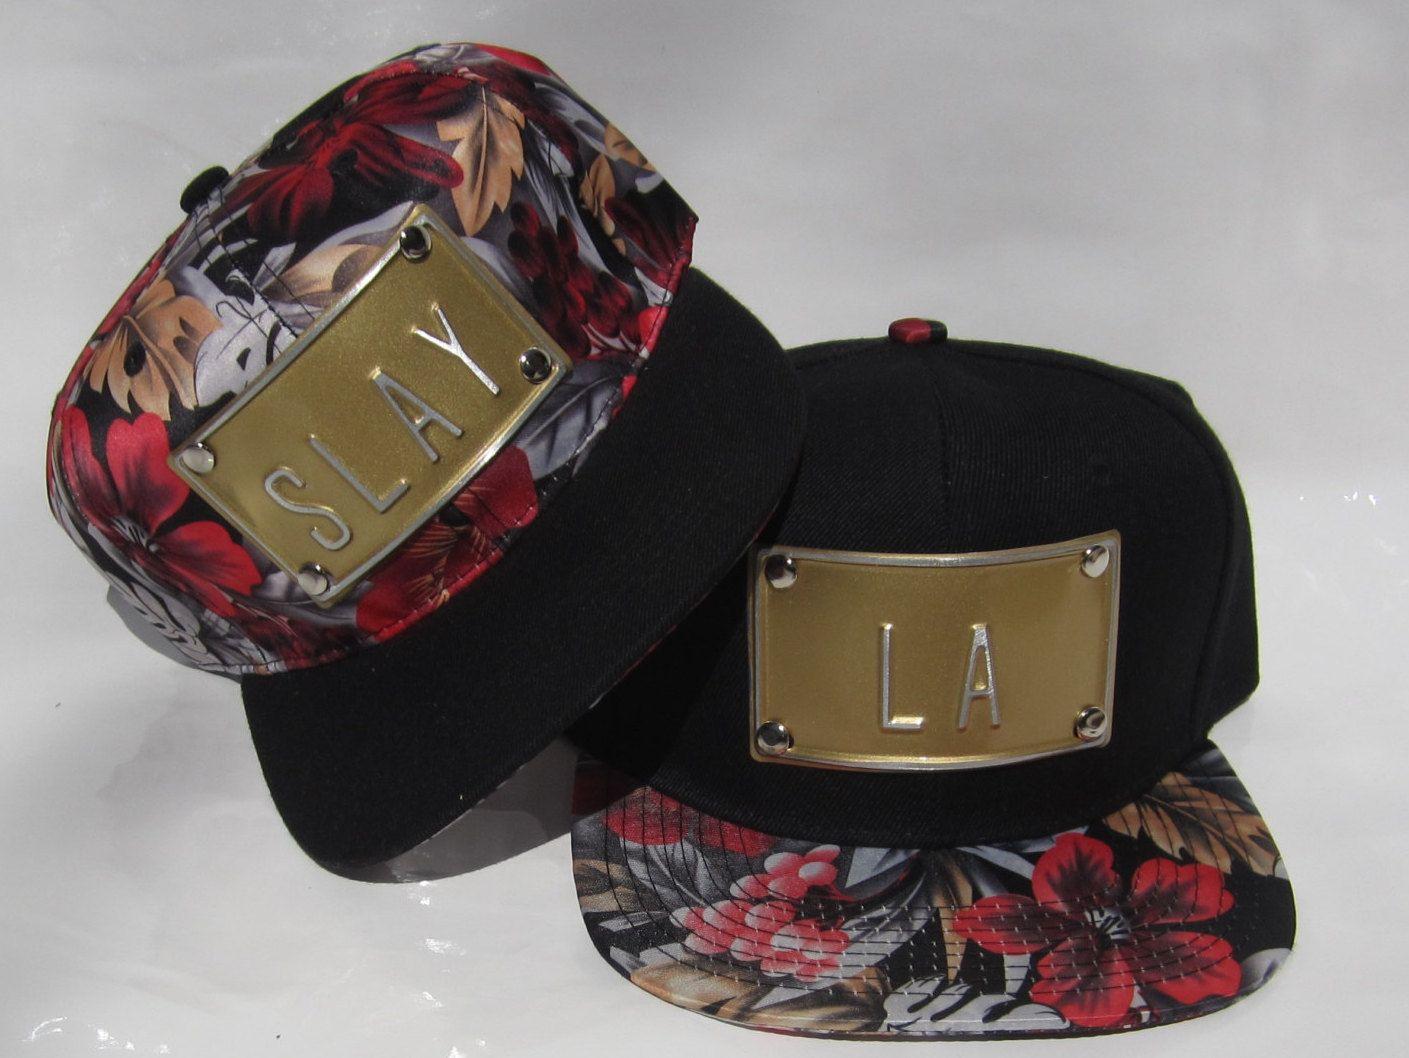 fb375c77fca ... HAT floral hawaiian snapback hawaiian hats flower snapbacks flower hat  hawaiian floral hat slay hat la slay snapback king hat by rojasclothing on  Etsy